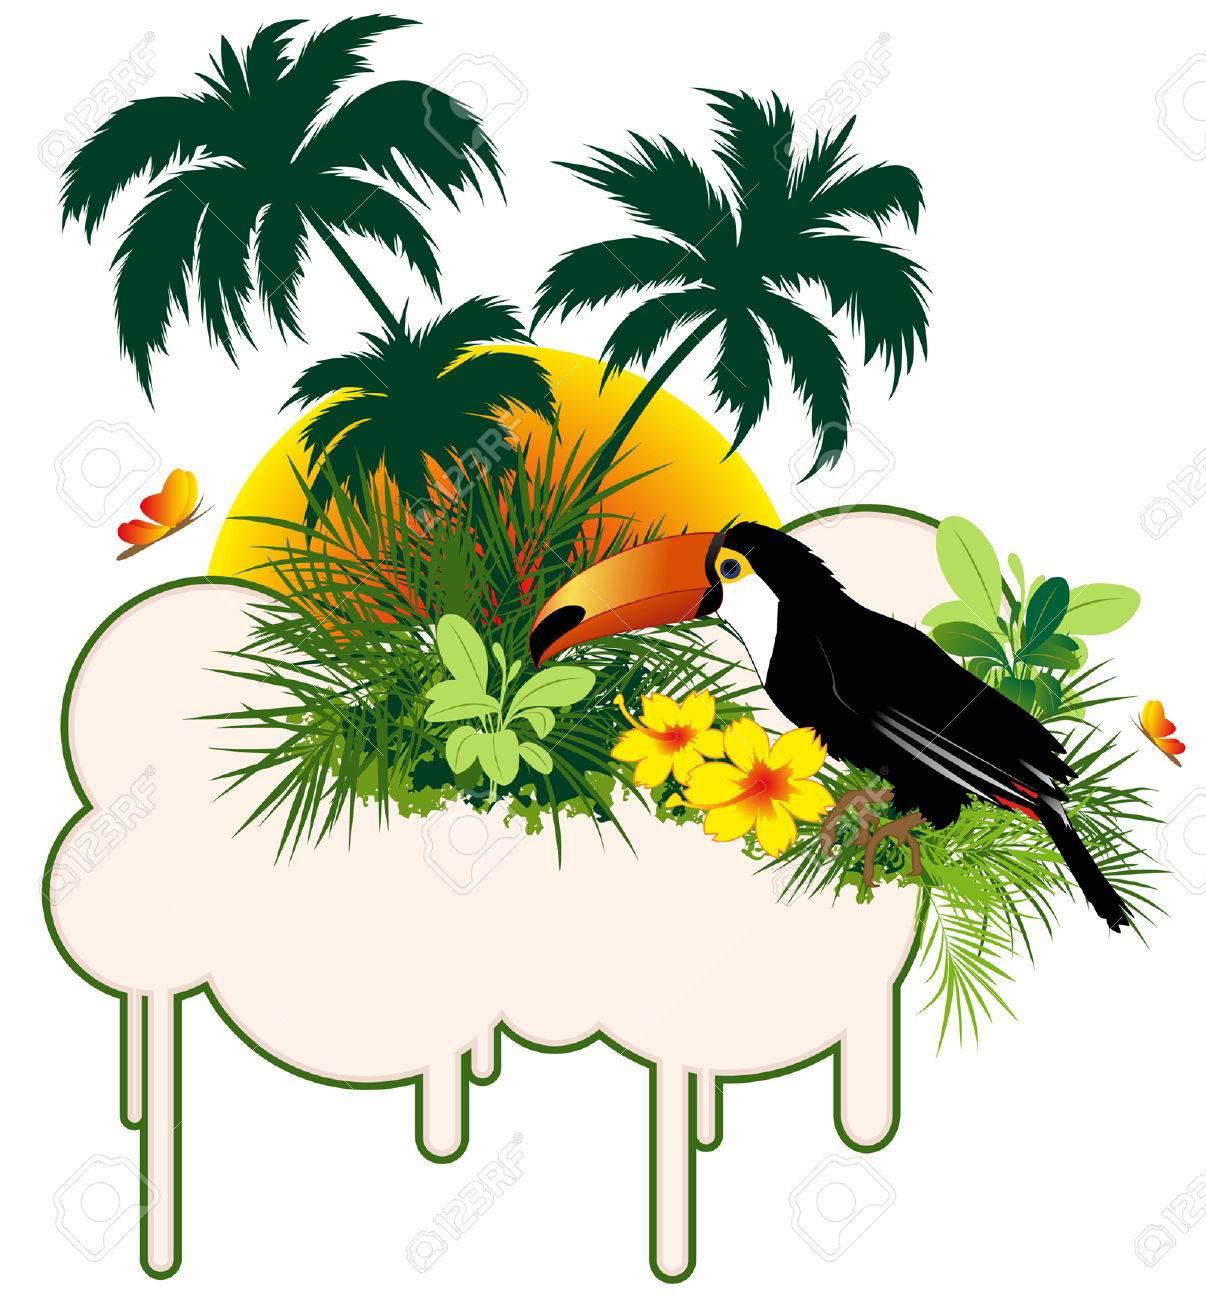 Cartoon Bird Blank Banner stock vector. Illustration of white - 61146089